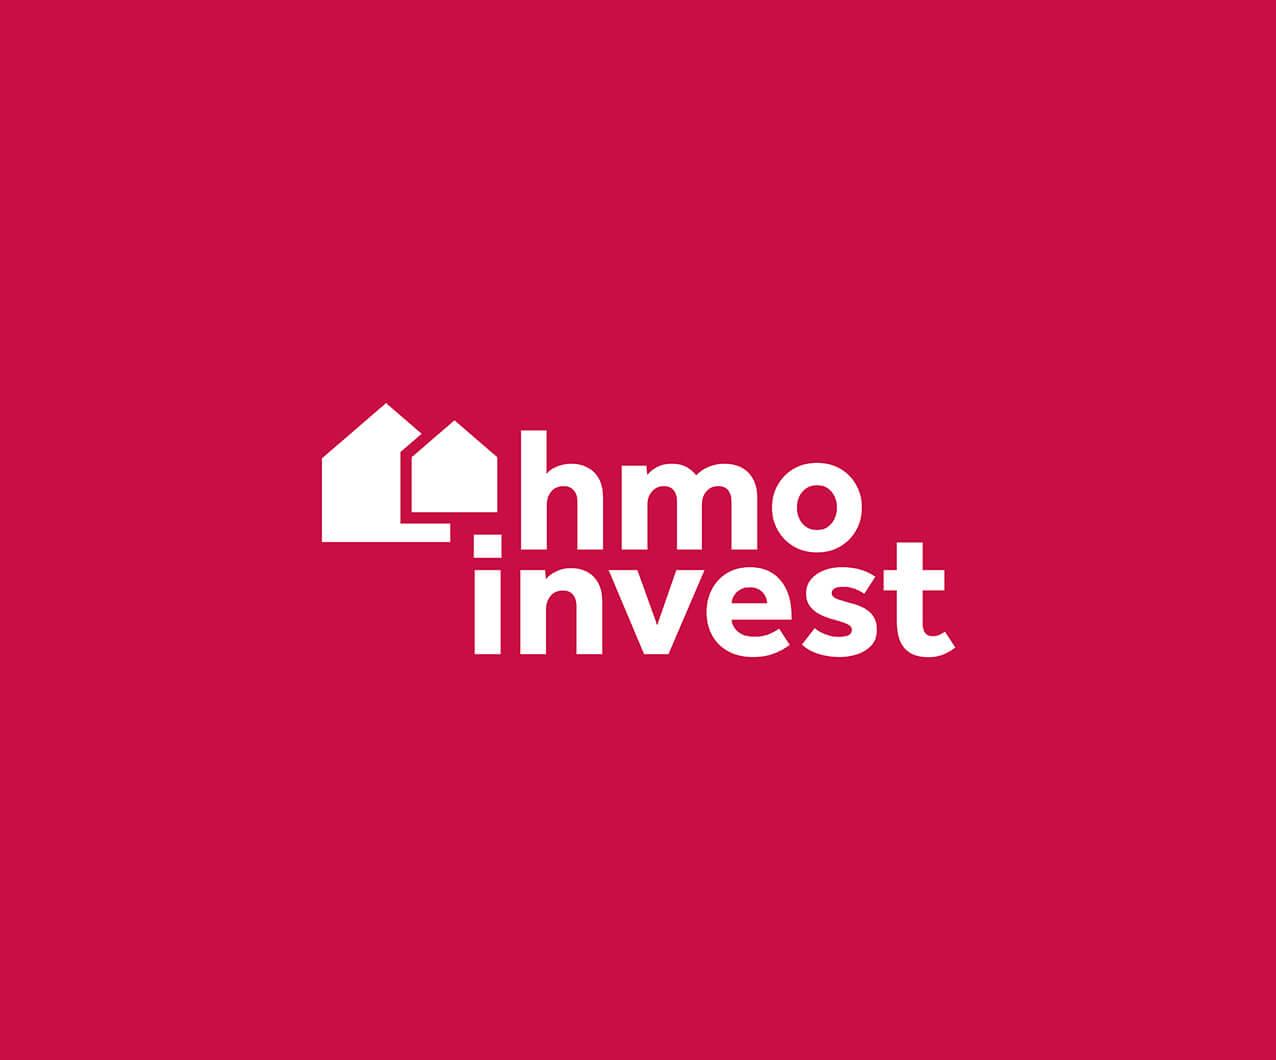 HMO Invest property developer logo design